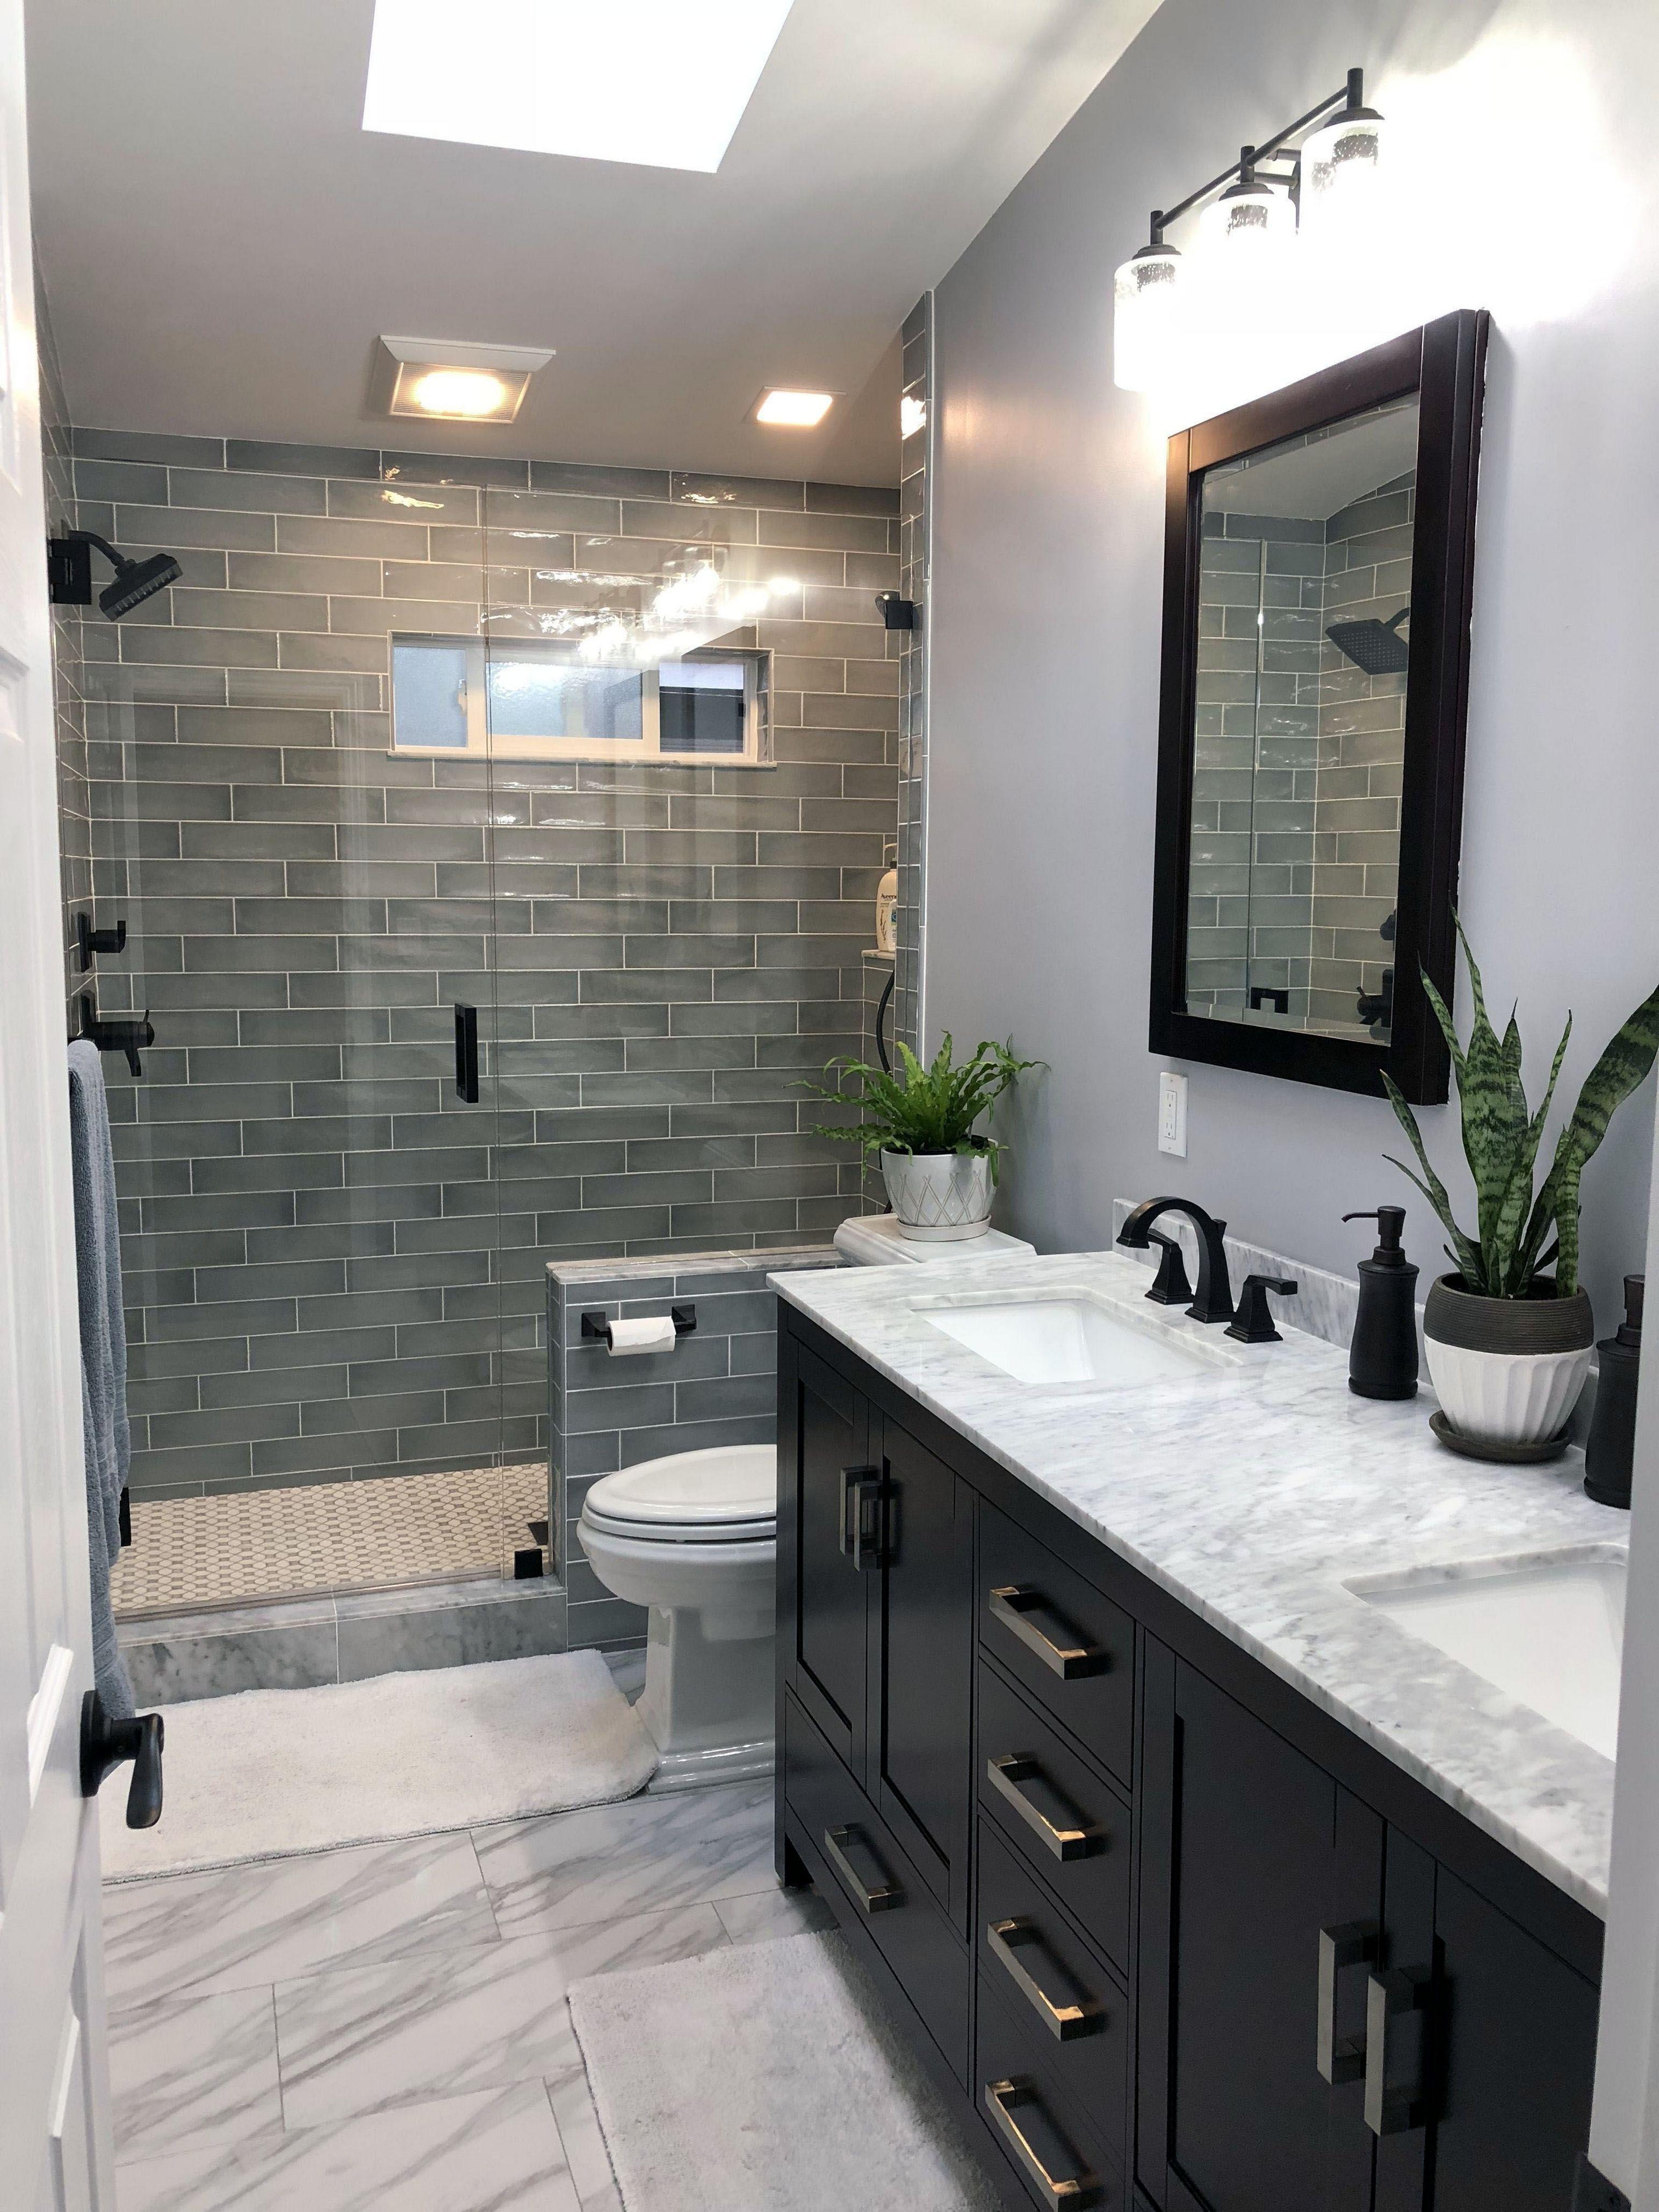 47 best master bathroom remodeling on a budget ideas on bathroom renovation ideas on a budget id=81561